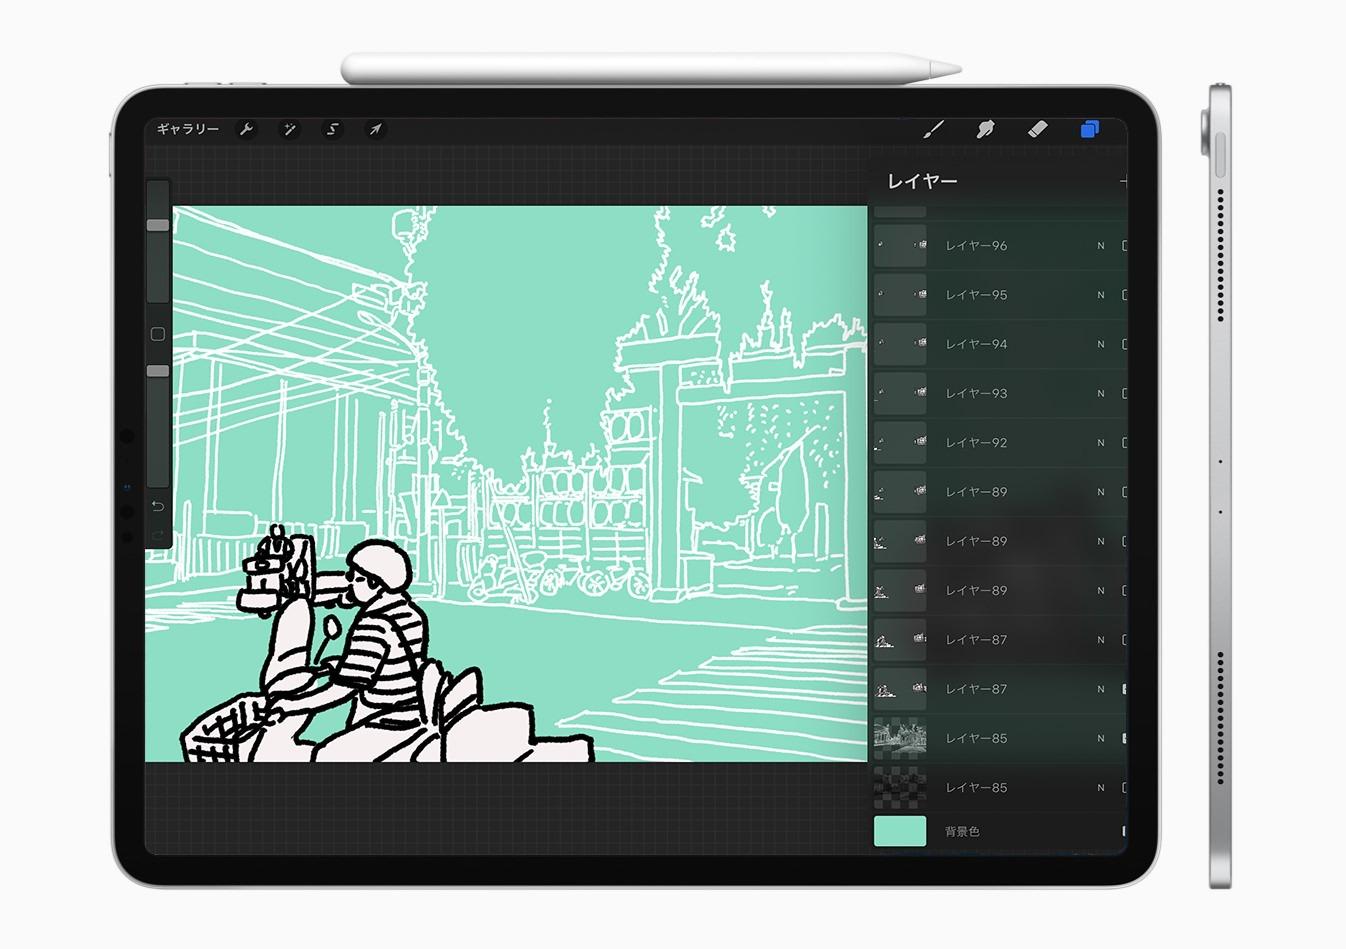 Ipad Pro Procreate After Effectsで簡単に作るアニメーション ロト